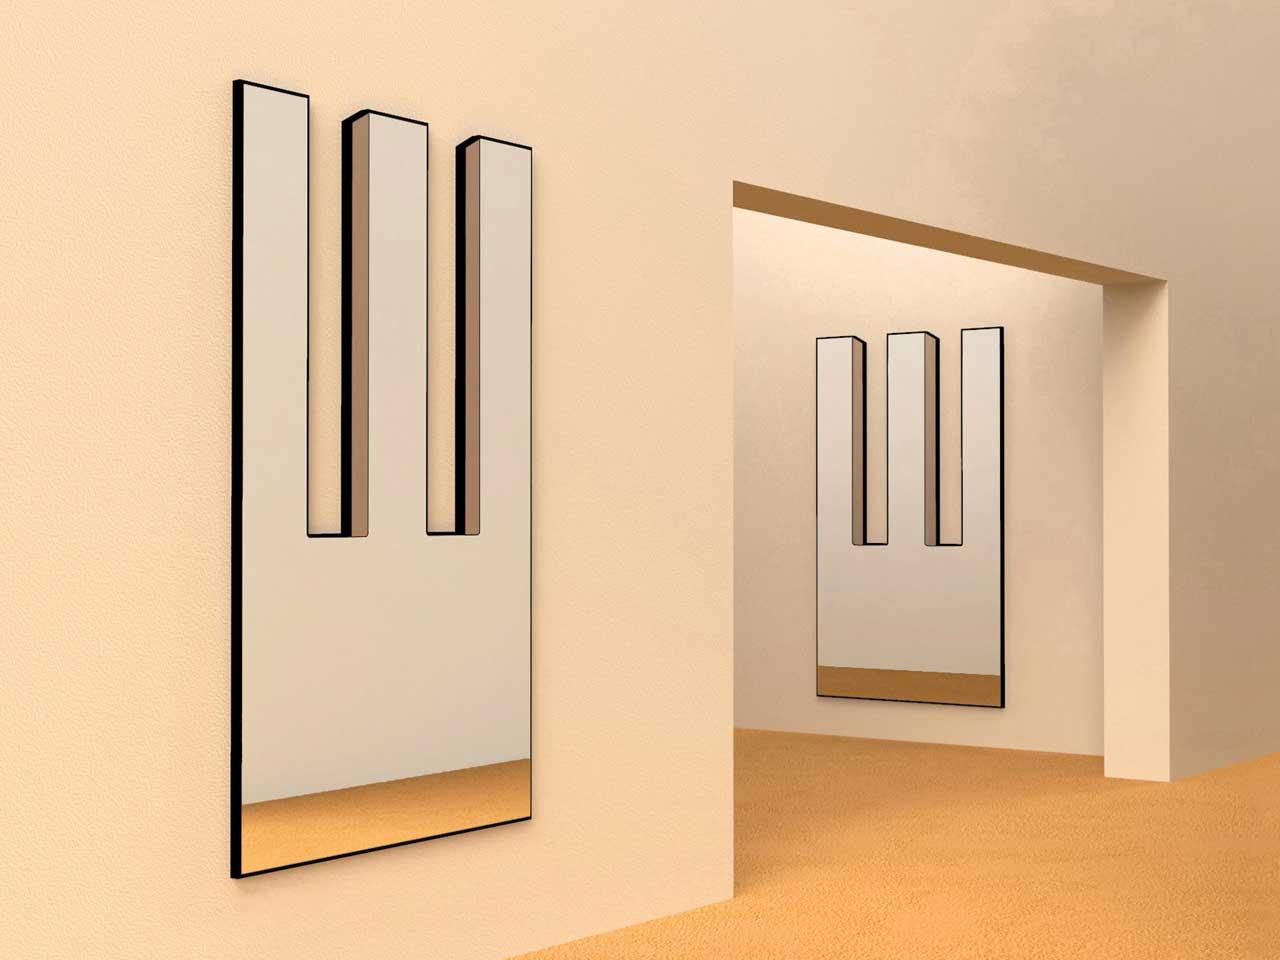 Bower Studios Unveils the Cuadra Mirror Inspired by Luis Barragán